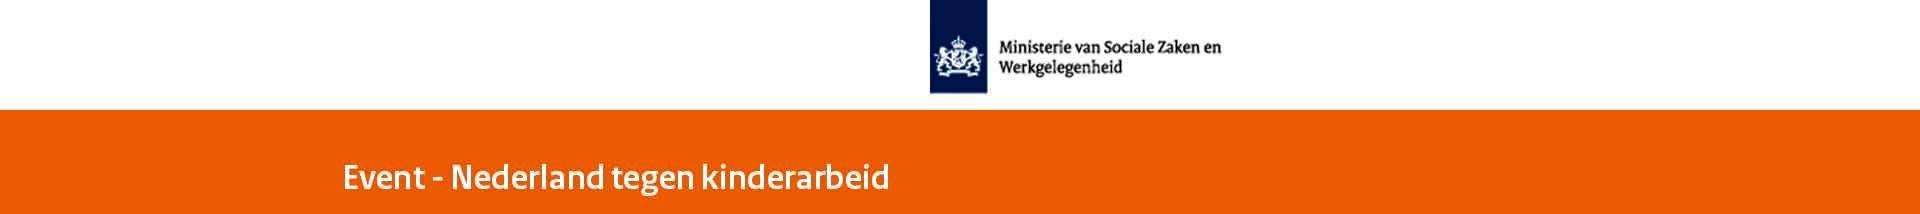 Nederland tegen kinderarbeid